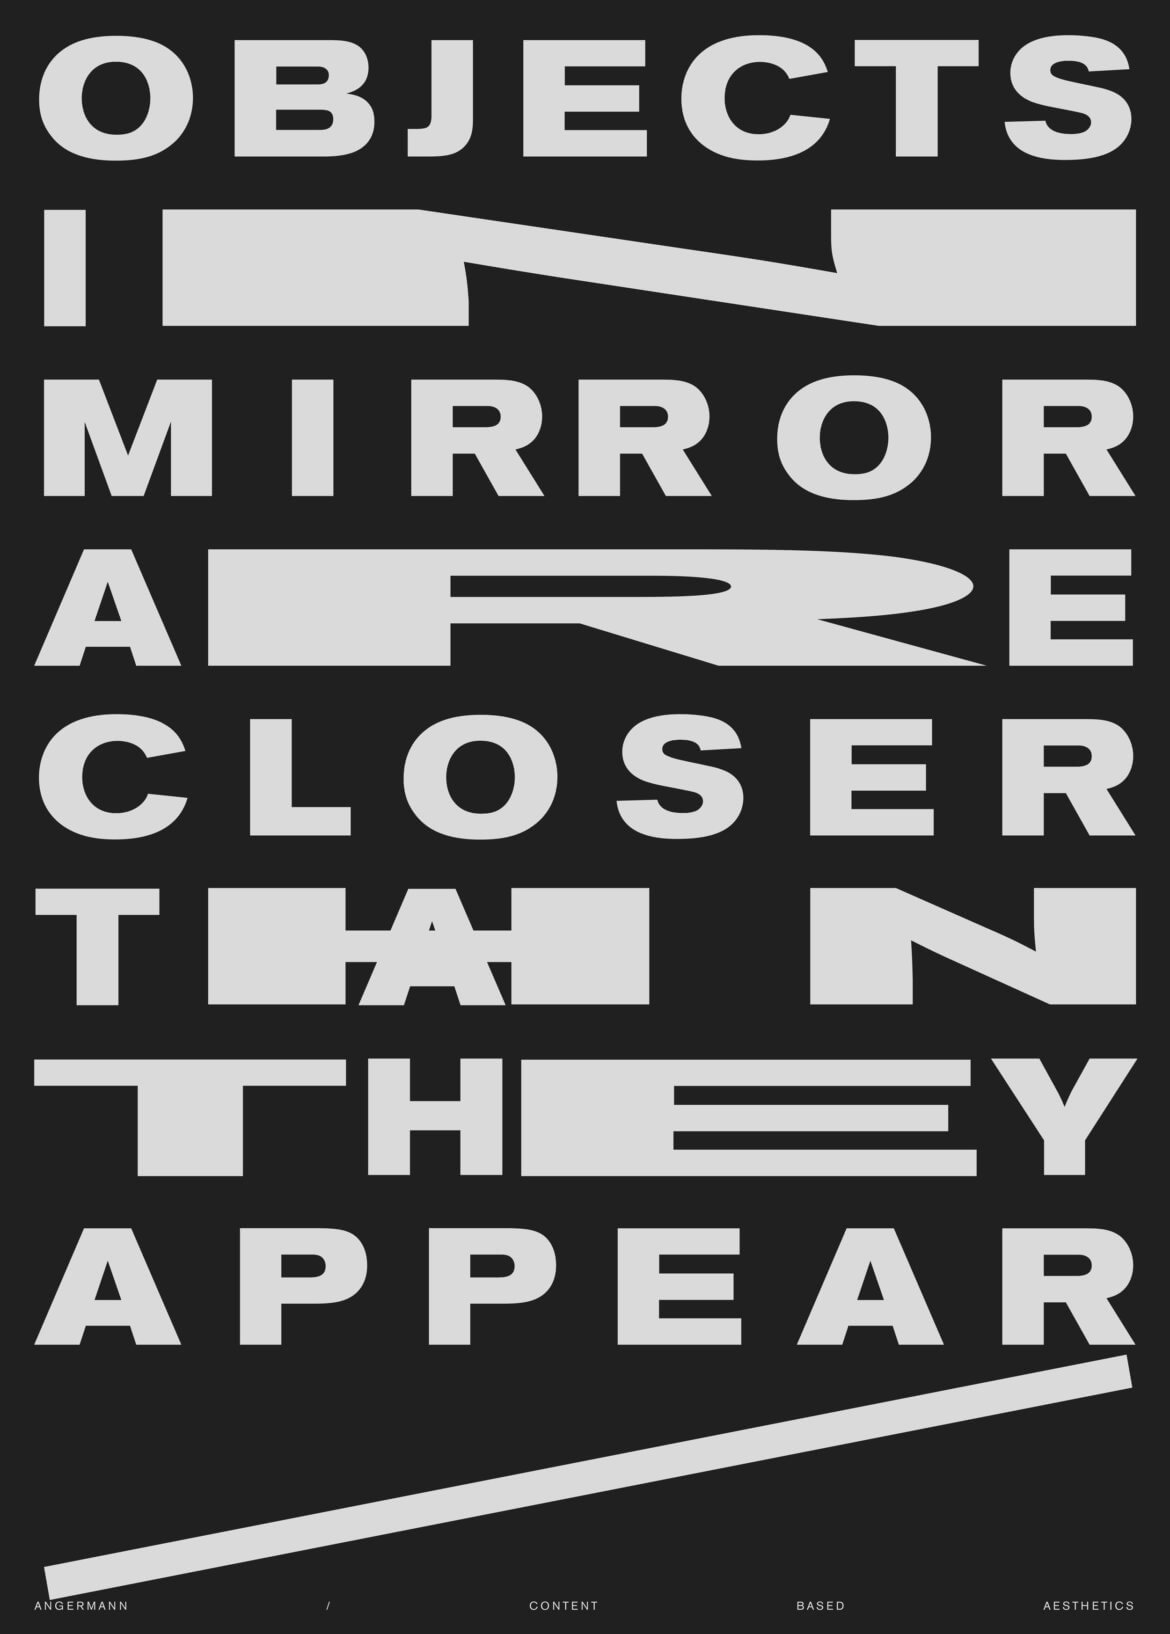 Daniel_Angermann_design_objects_in_mirror_poster oimactta Plakat